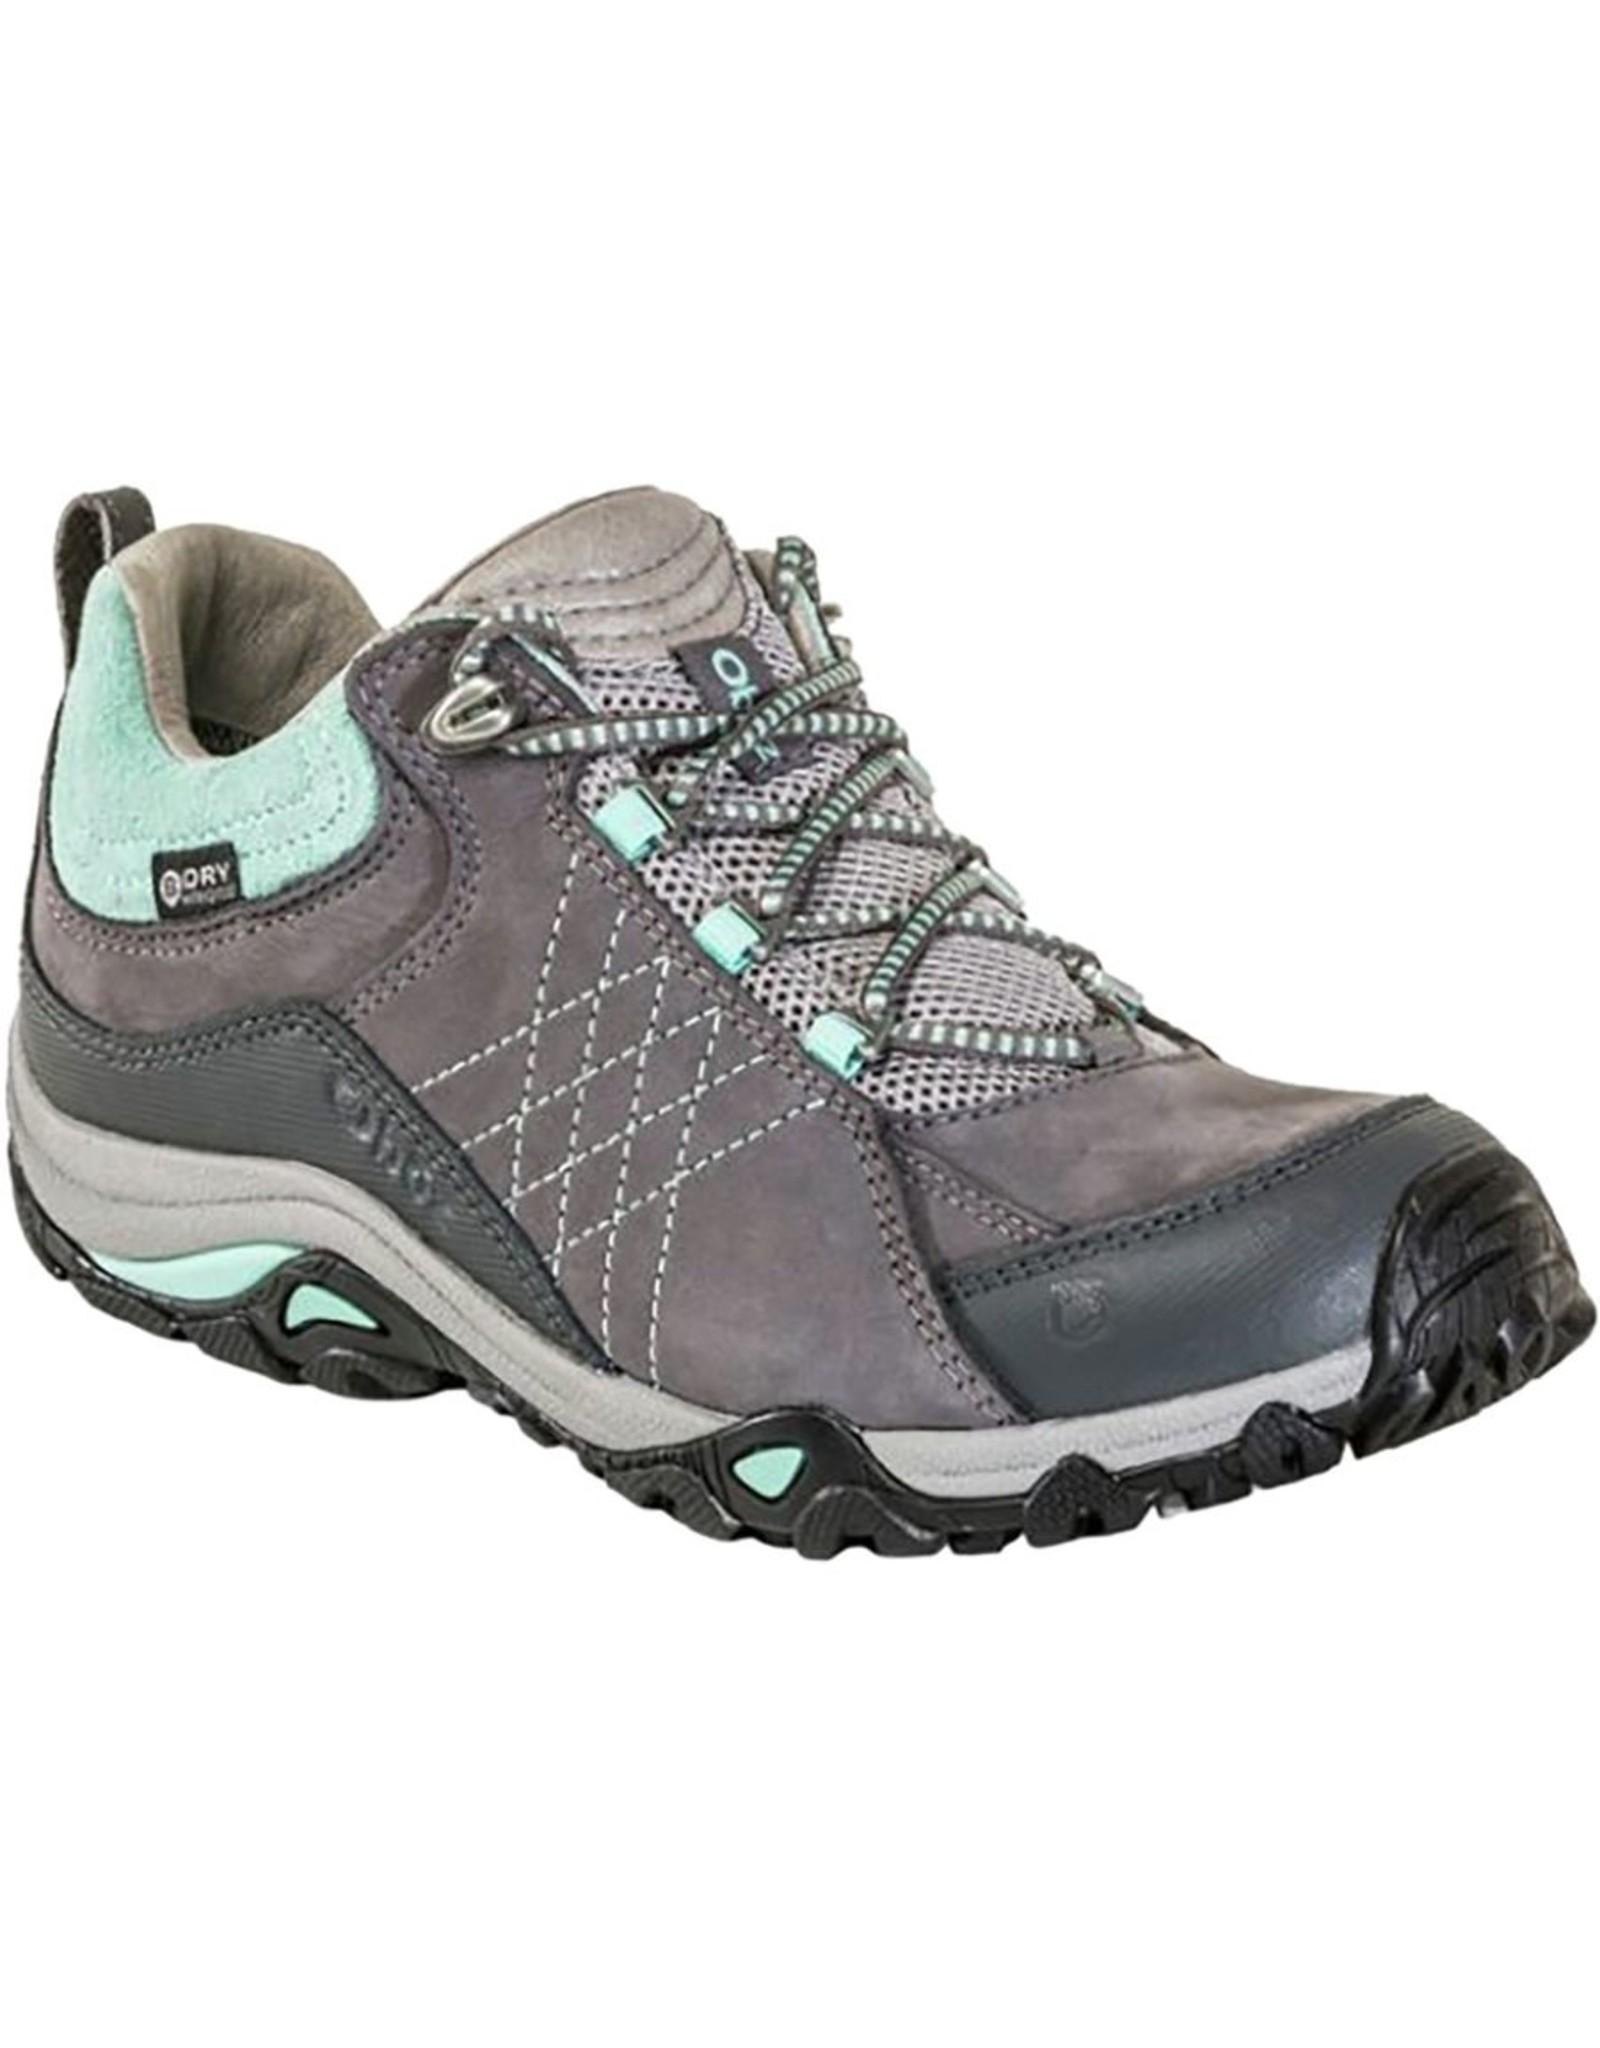 Oboz Oboz Women's Sapphire Low B-Dry Waterproof Hiking Shoe Charcoal / Beach Glass 10.5